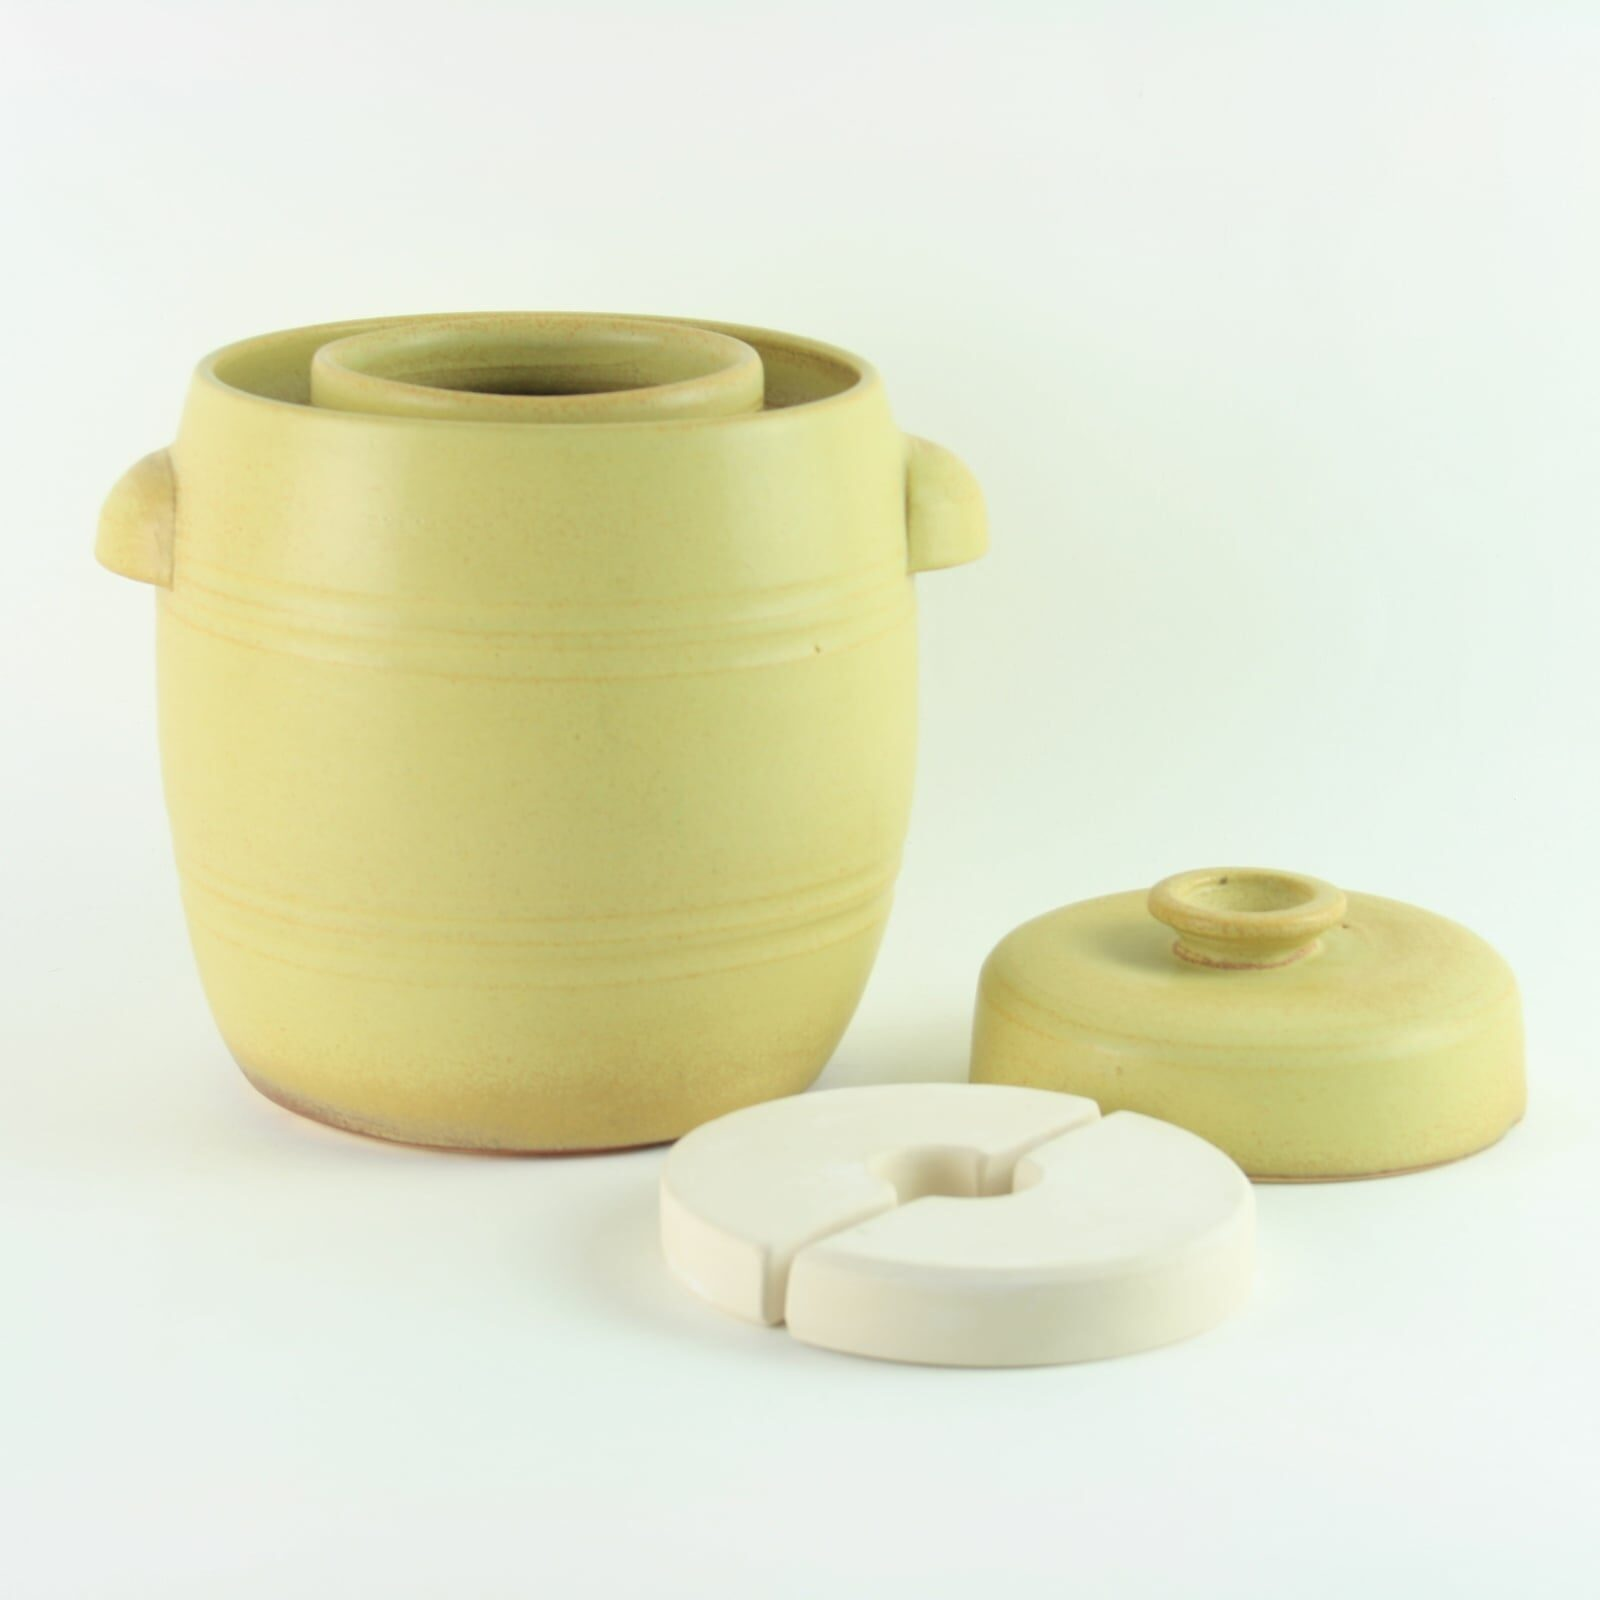 handmade 2.5 litre ceramic fermentation crock for making sauerkraut, kimchi and pickles